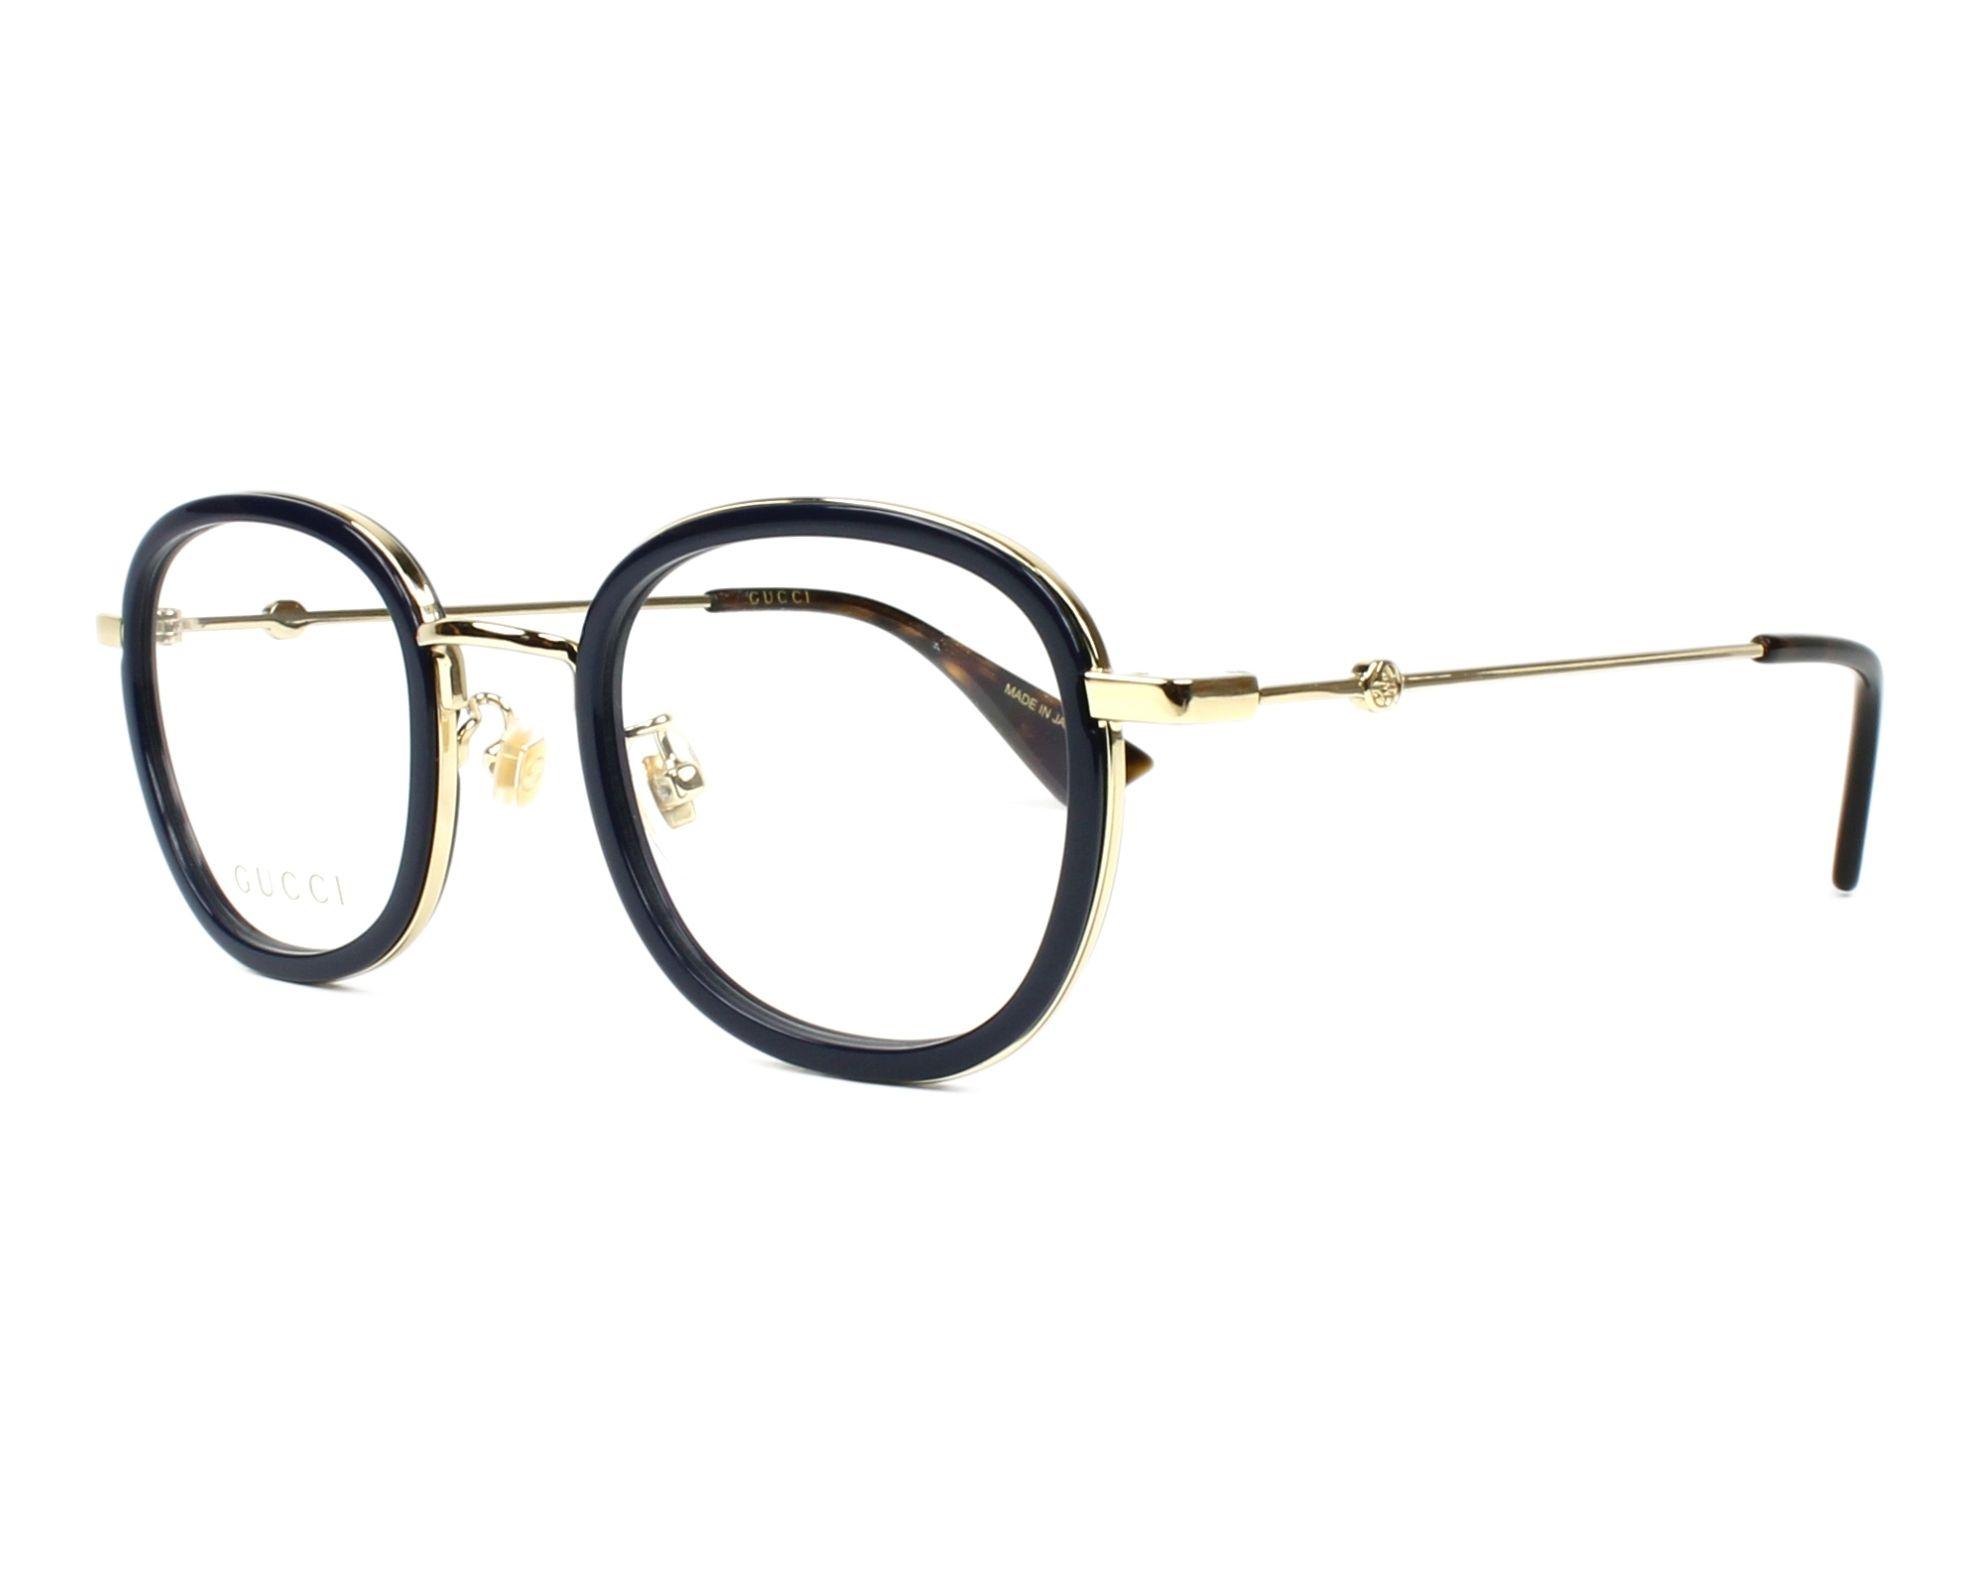 lunettes de vue de gucci en gg 0111 o 004. Black Bedroom Furniture Sets. Home Design Ideas